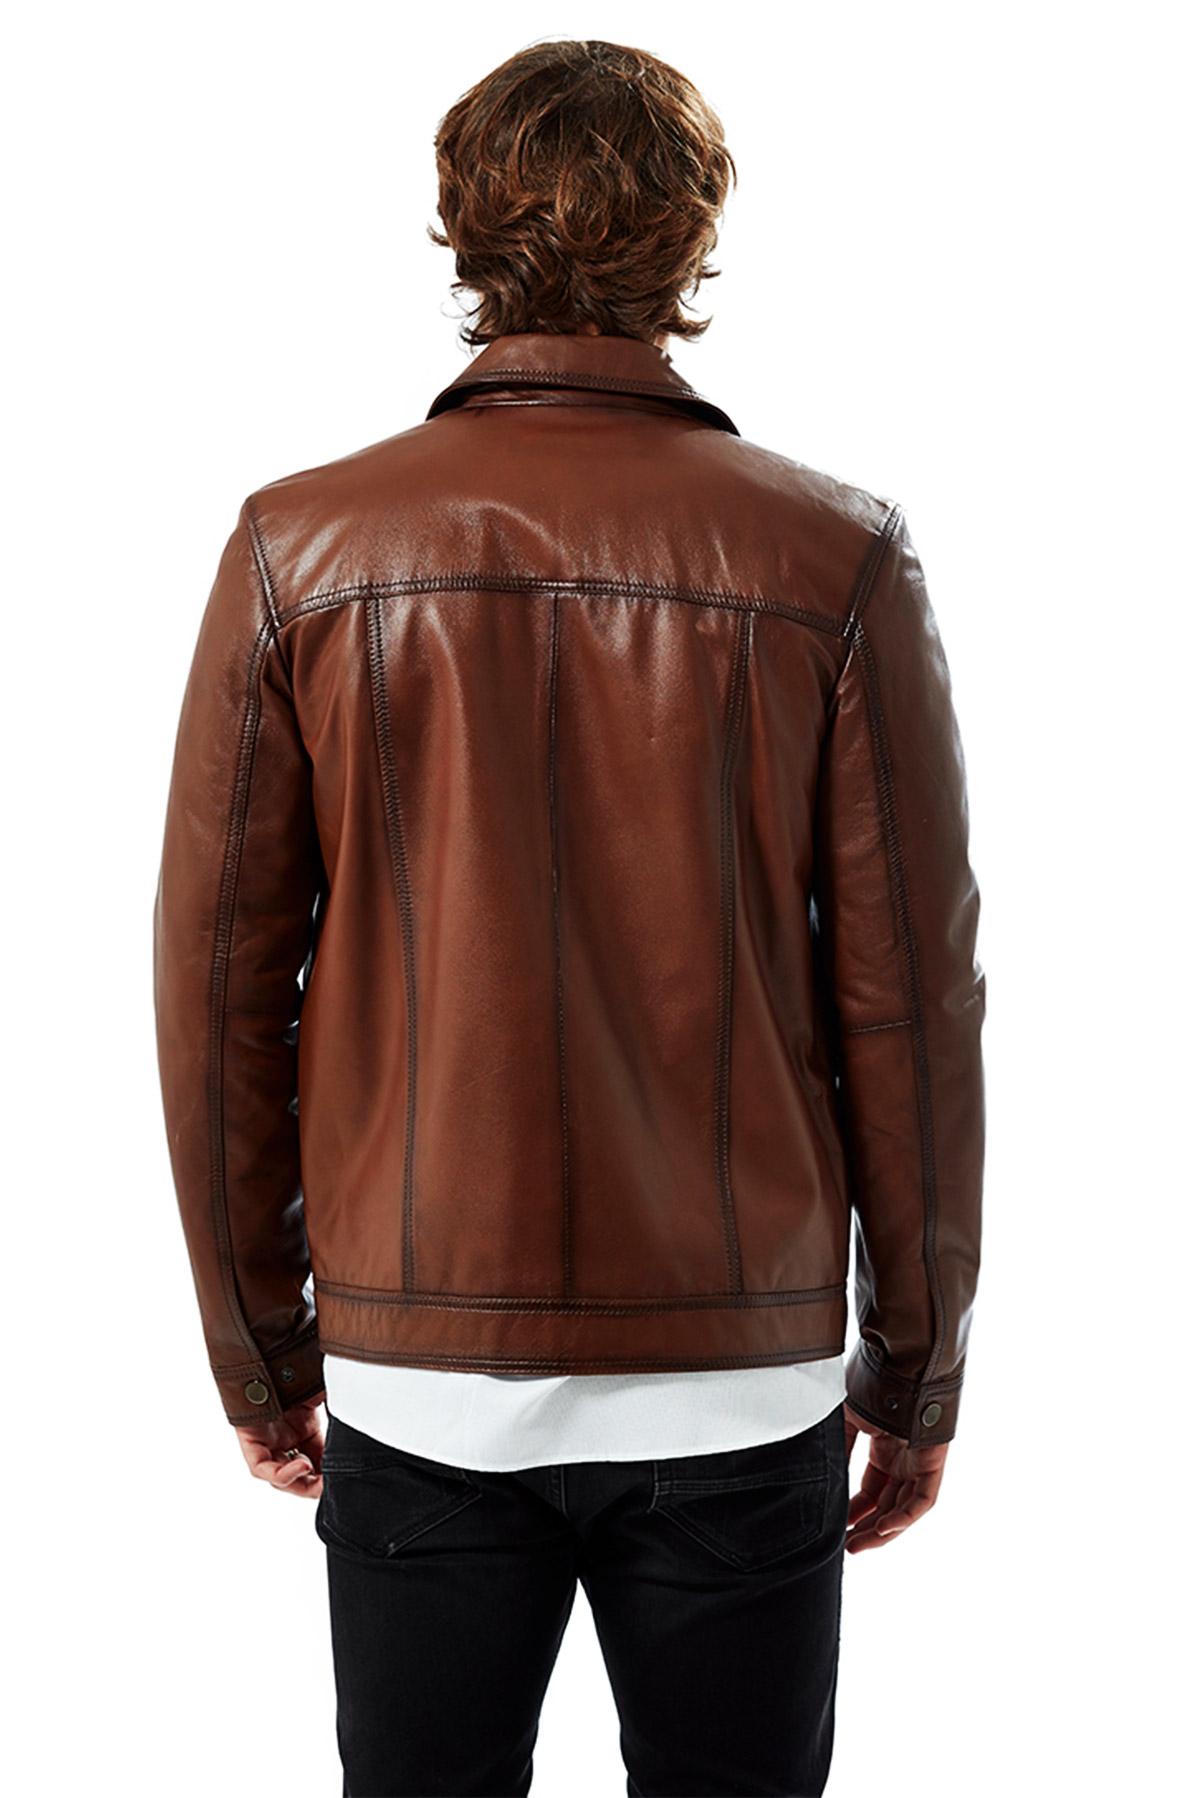 genuine leather jacket plus size